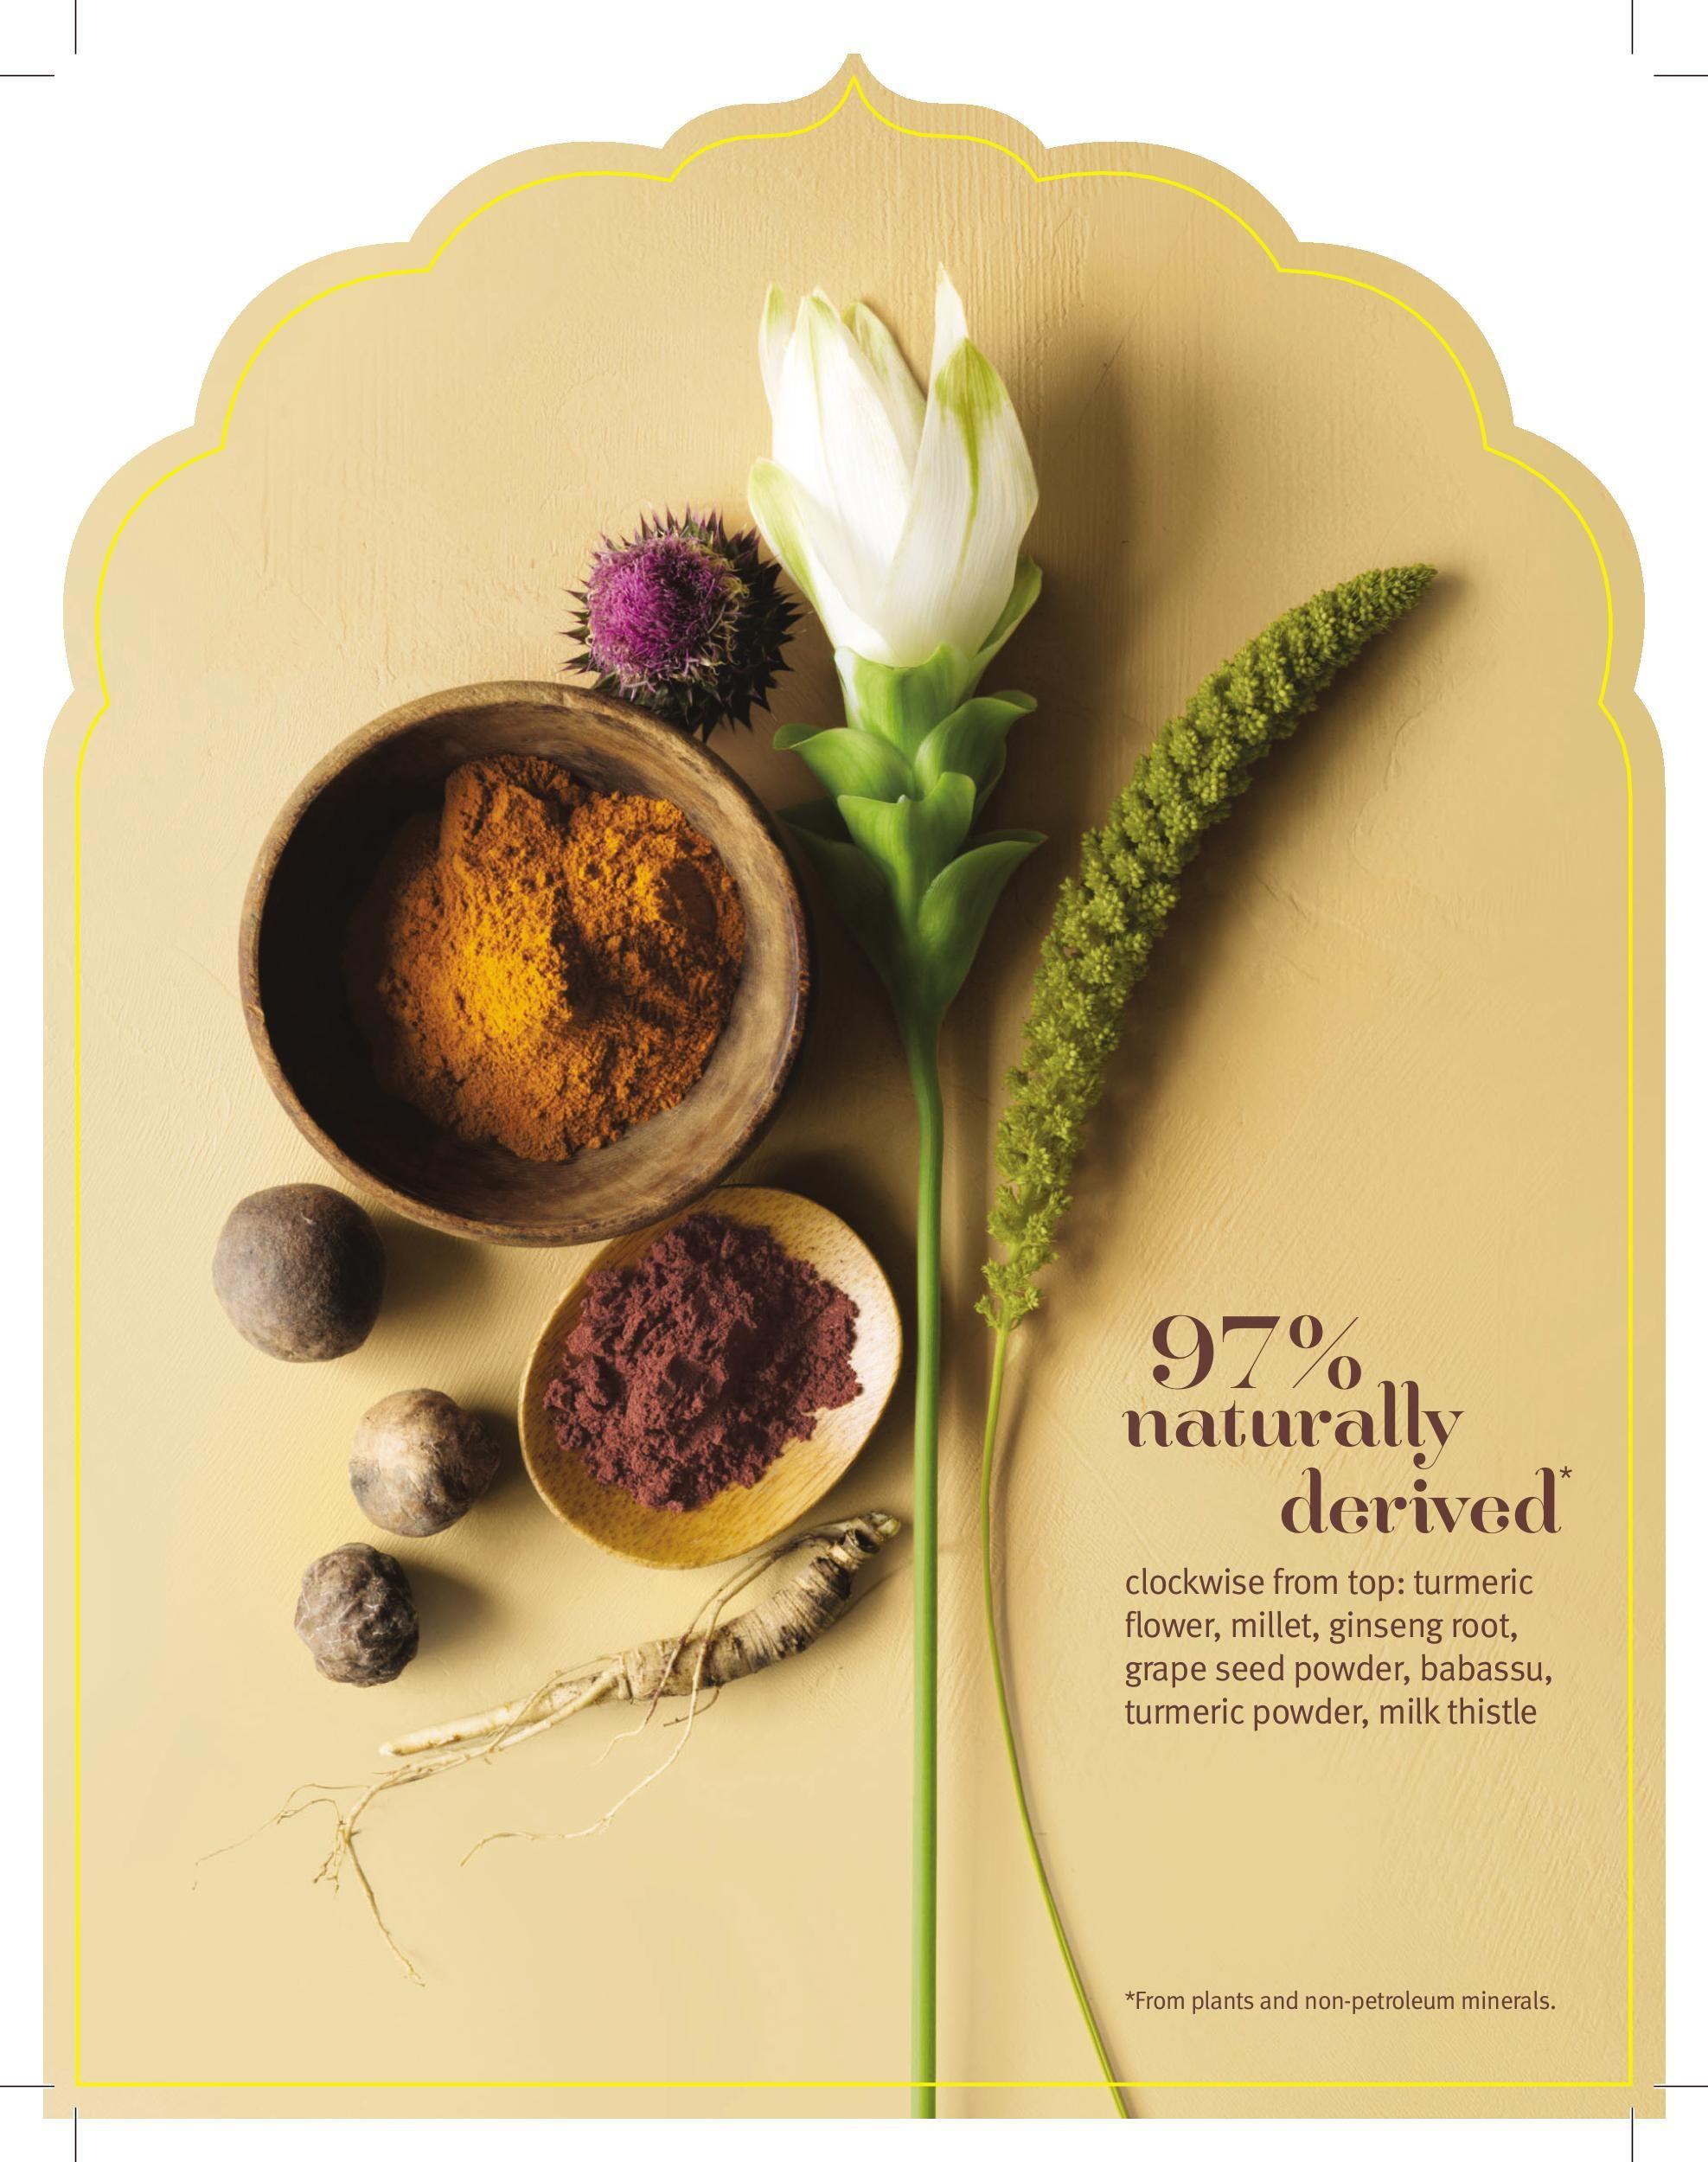 Invati Aveda 97 Naturally Derived Ingredients Hair Loss Natural Remedy Hairstyles For Thin Hair Help Hair Loss